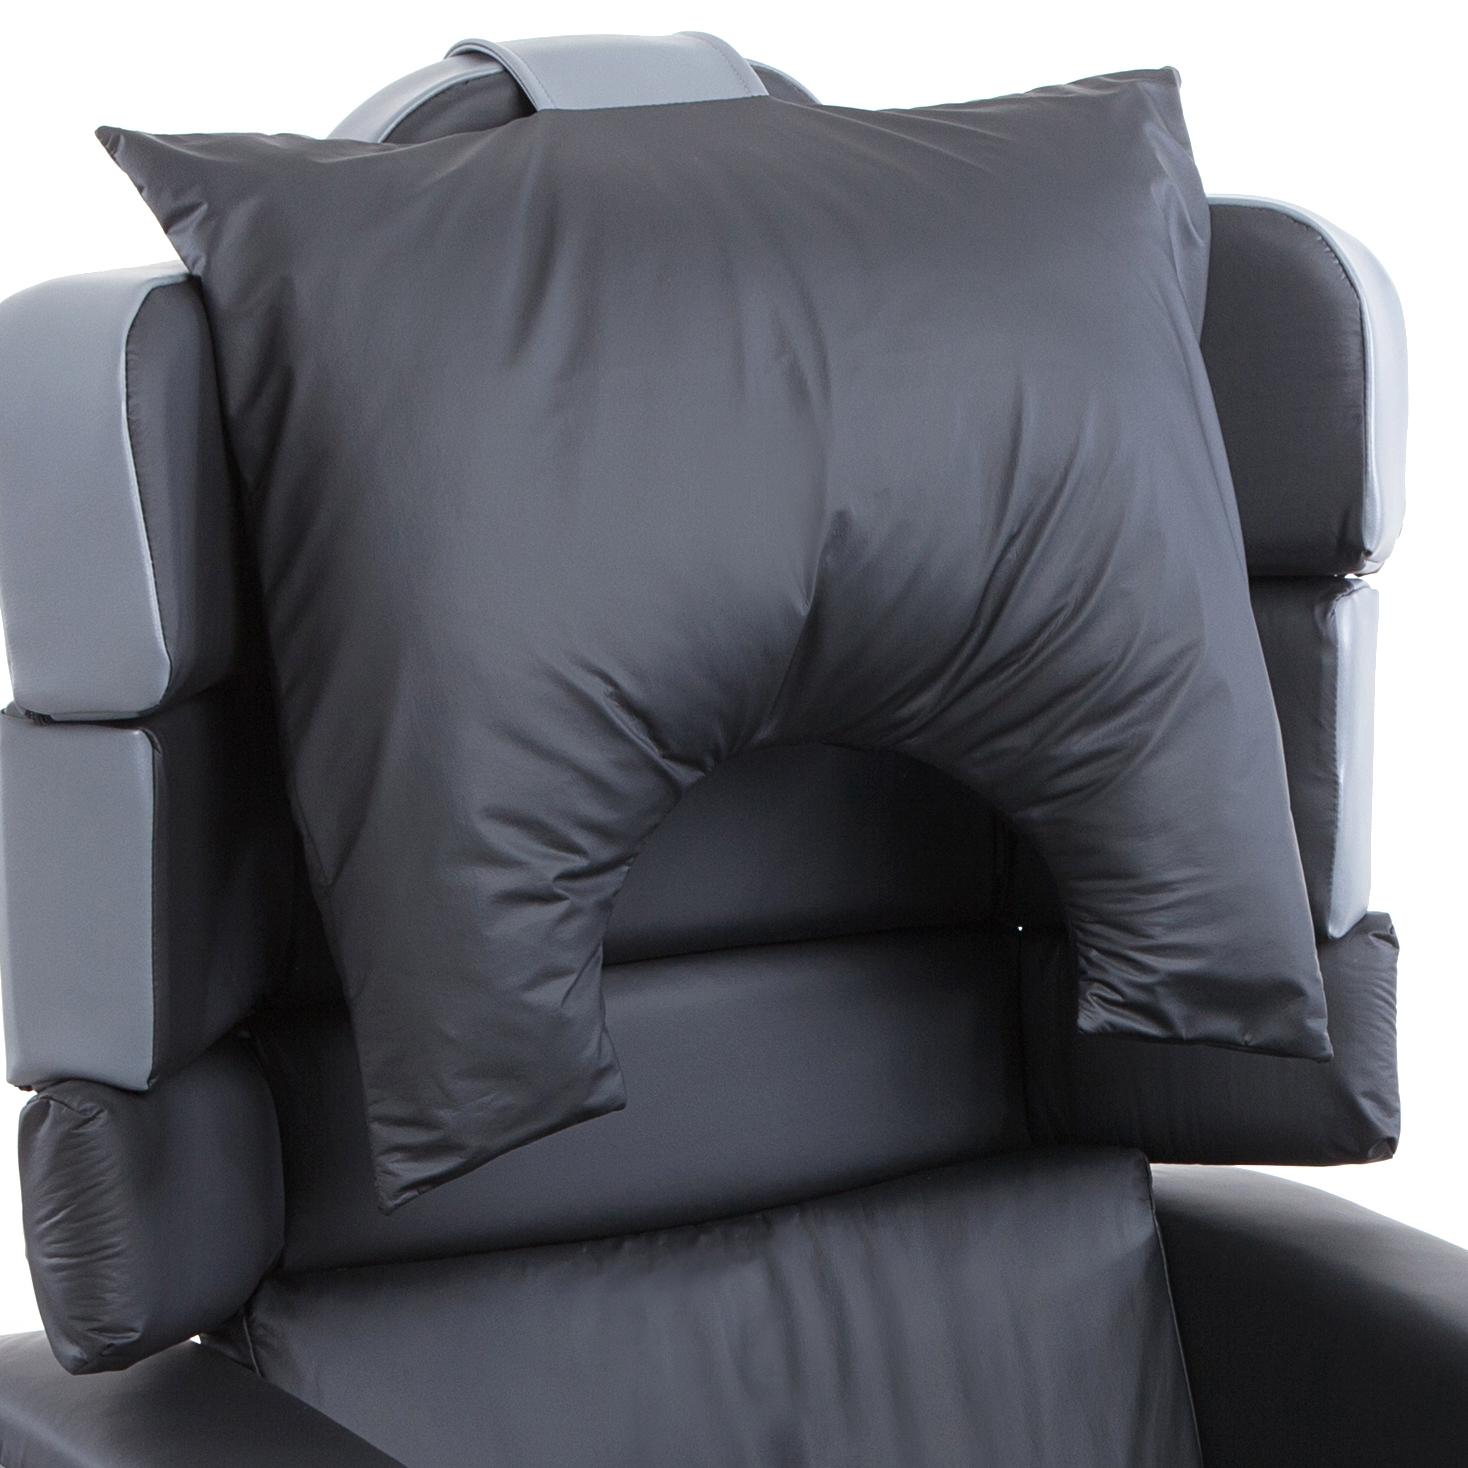 Soft_Profiled_Headrest